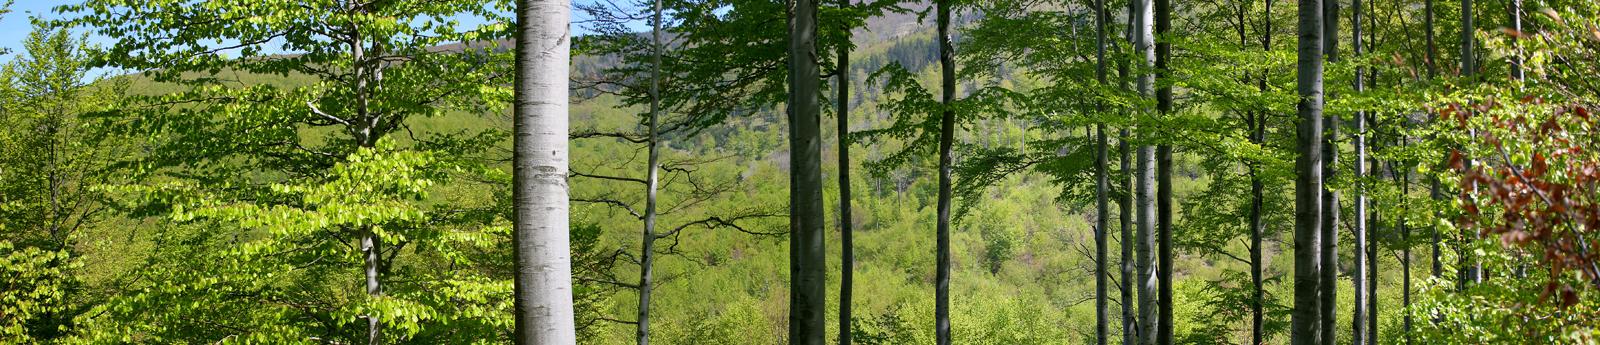 trees_panorama